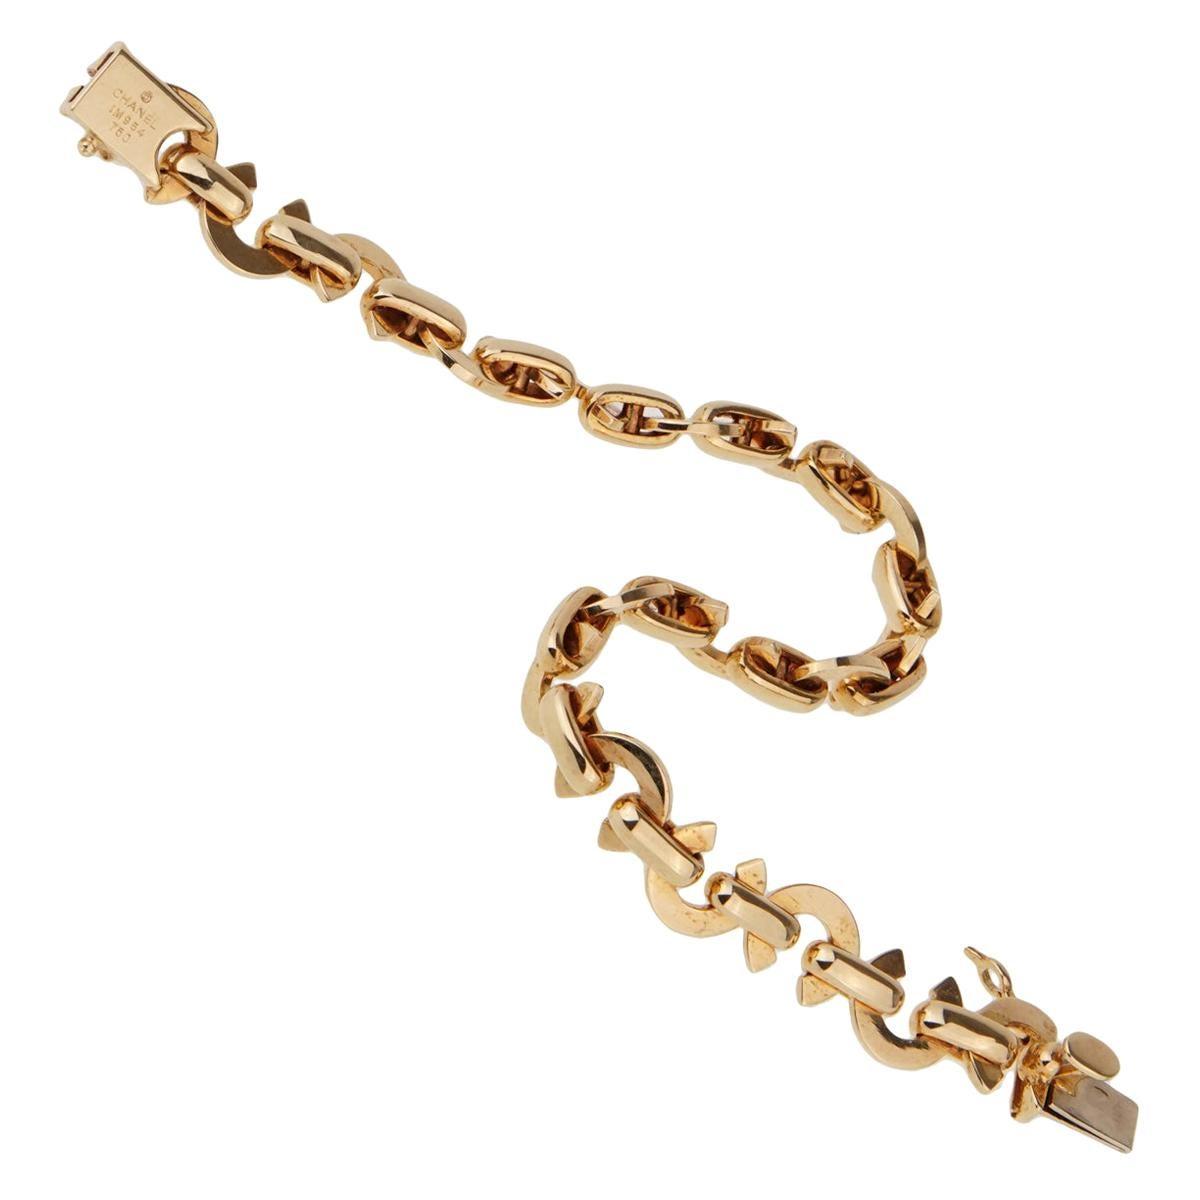 Chanel Yellow Gold C Charm Bracelet